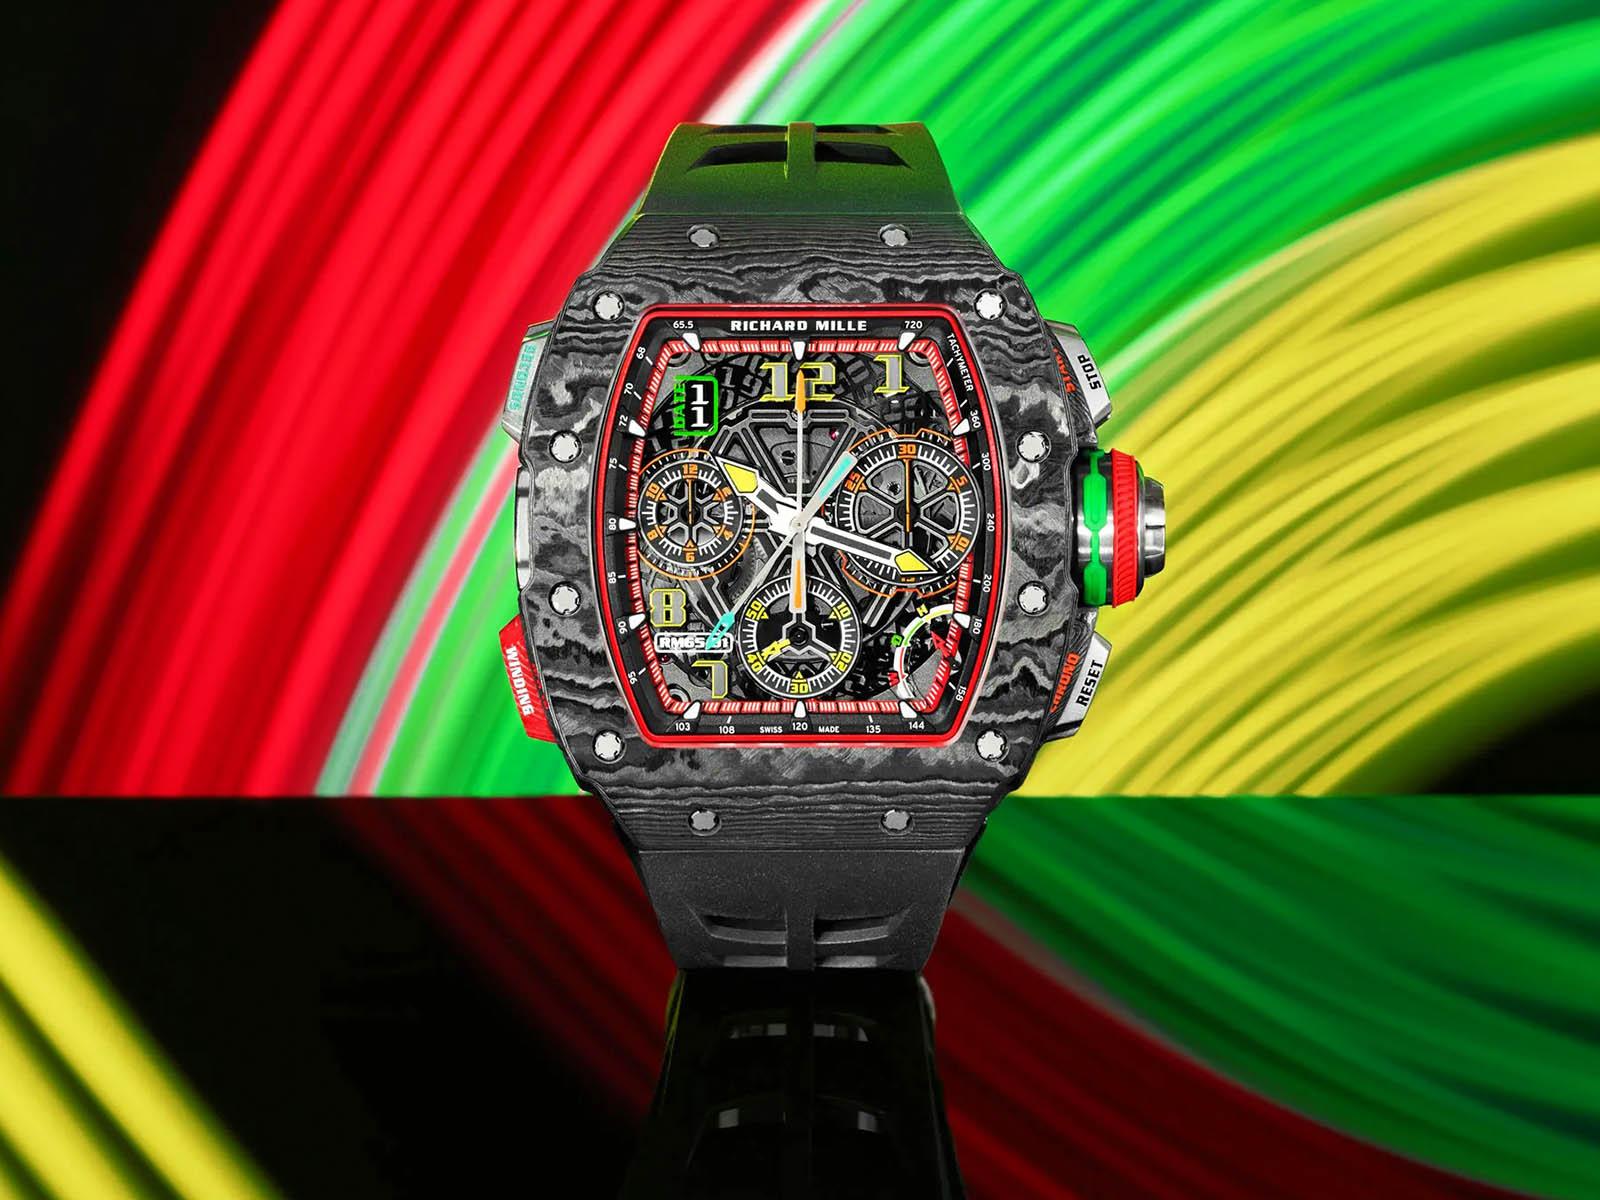 richard-mille-rm-65-01-automatic-split-seconds-chronograph-9.jpg